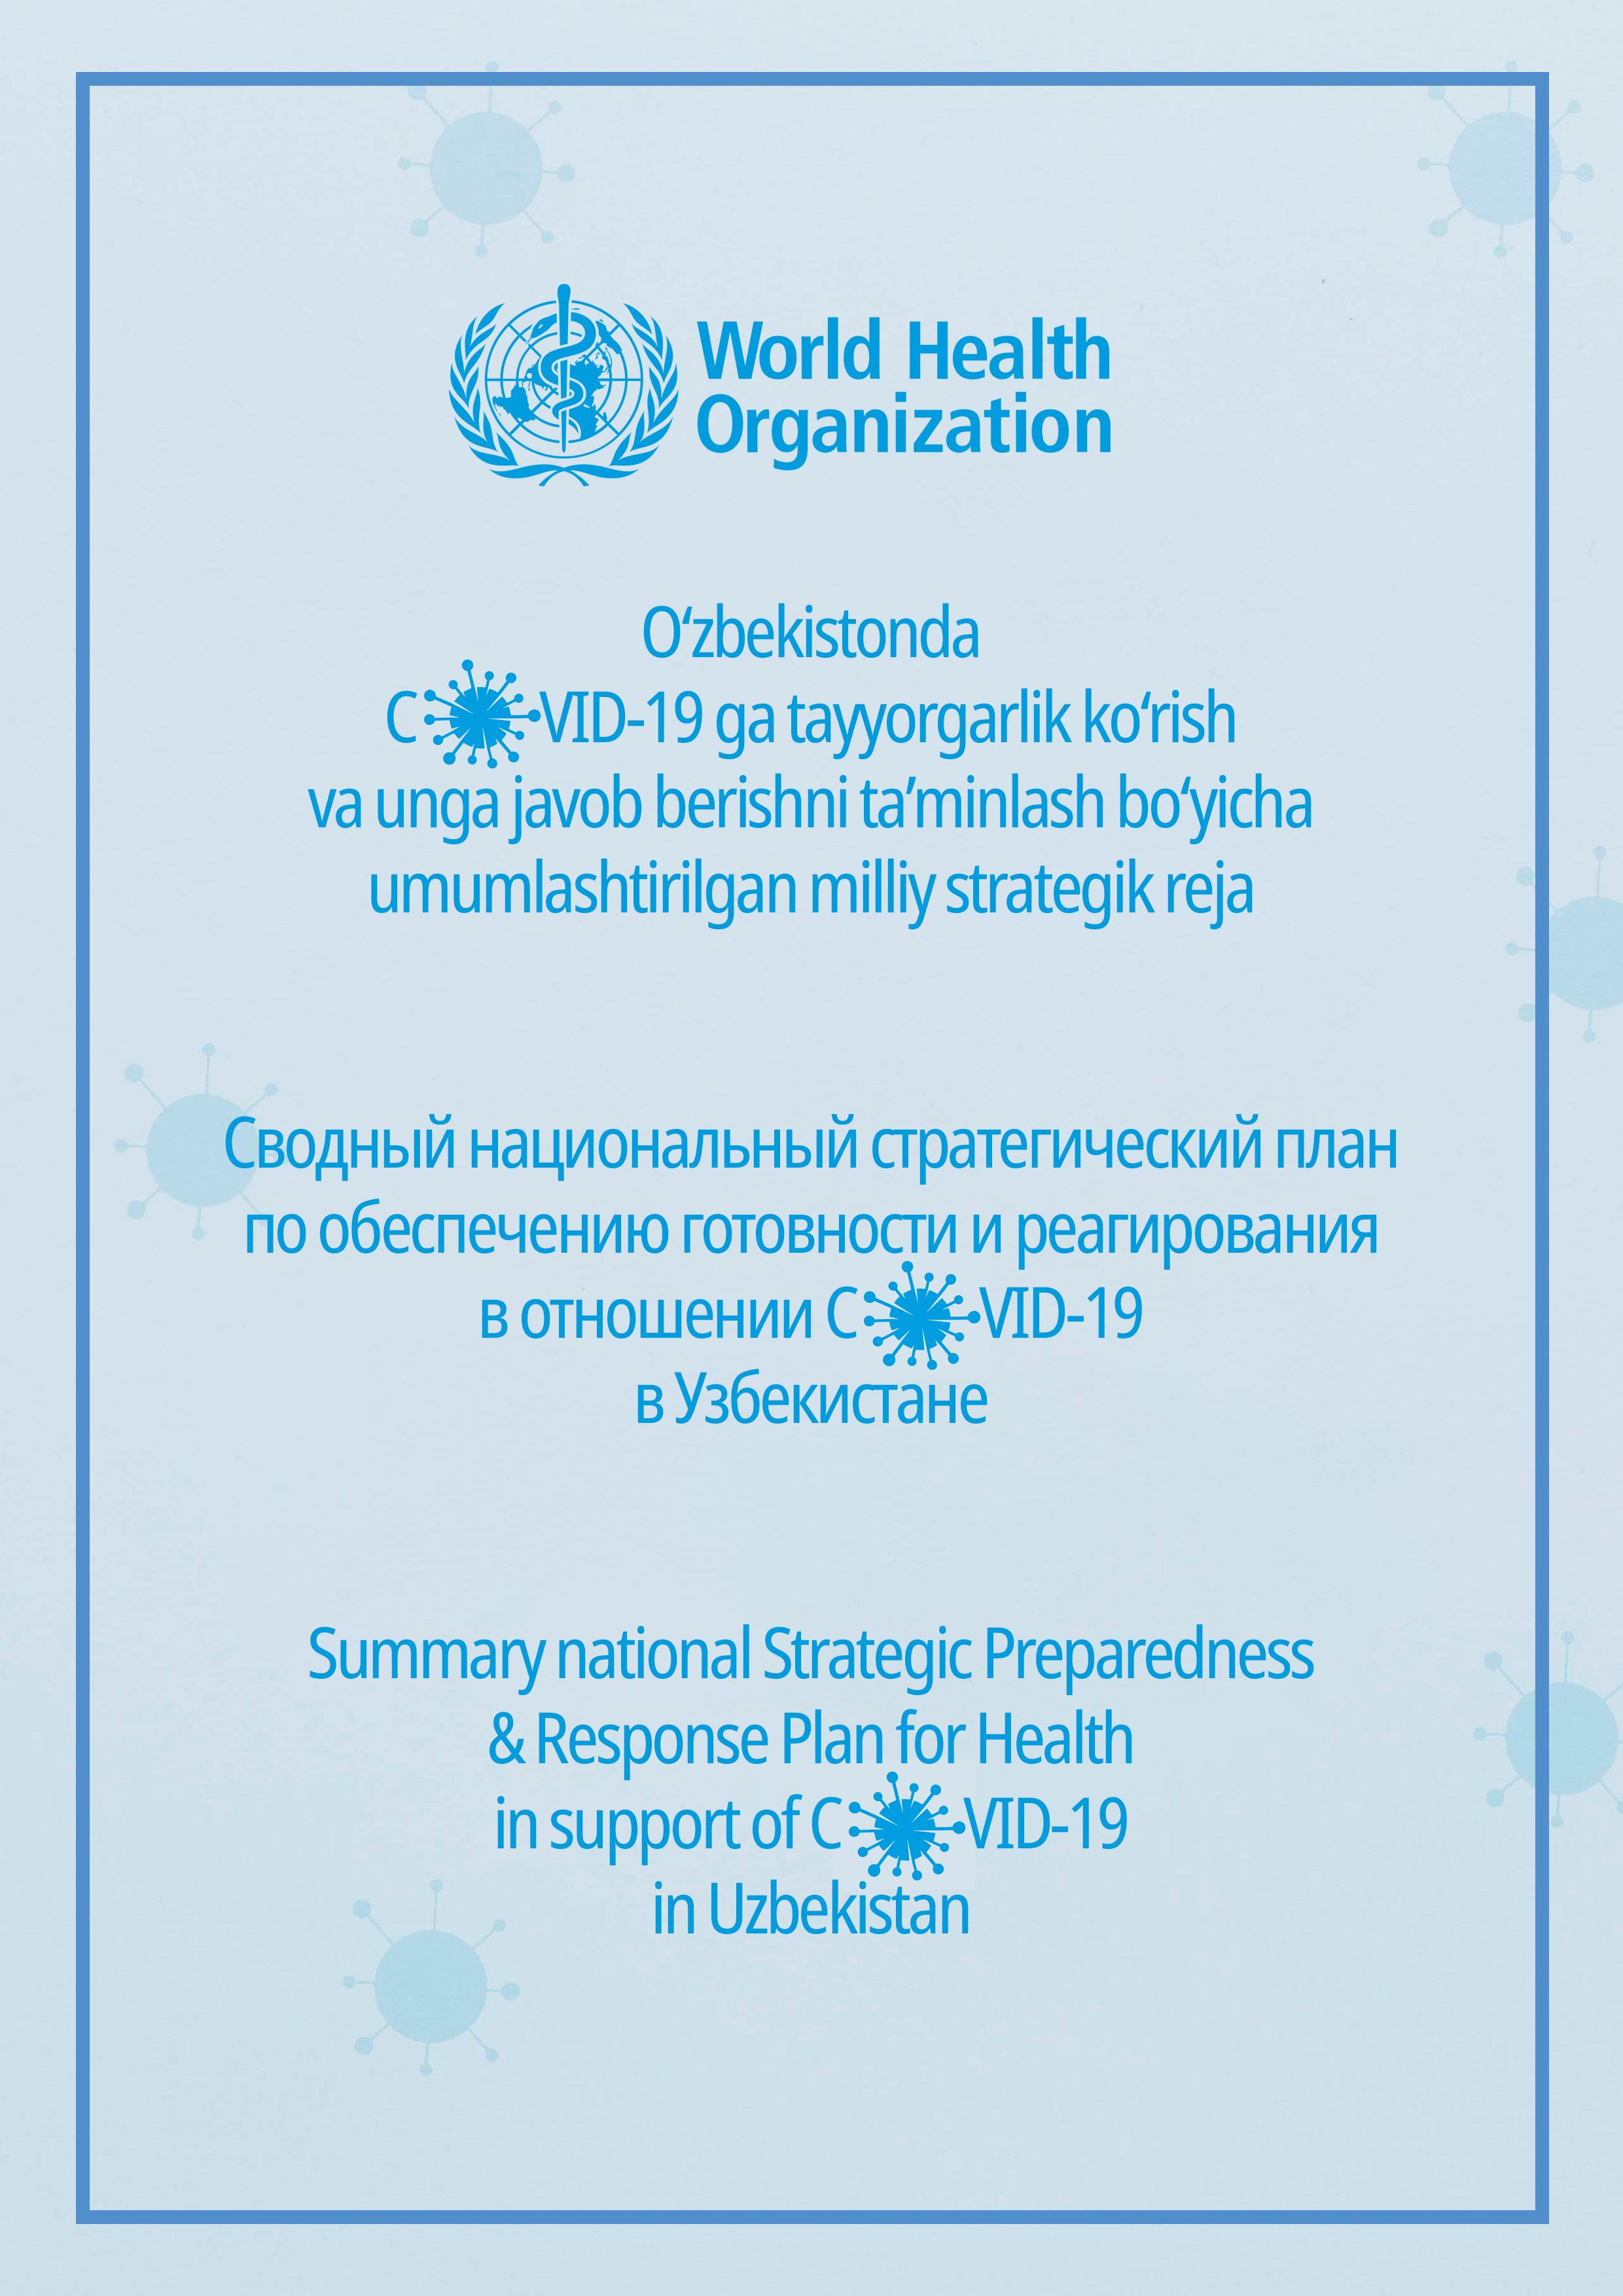 Summary national Strategic Preparedness & Response Plan for Health in support of COVID-19 in Uzbekistan